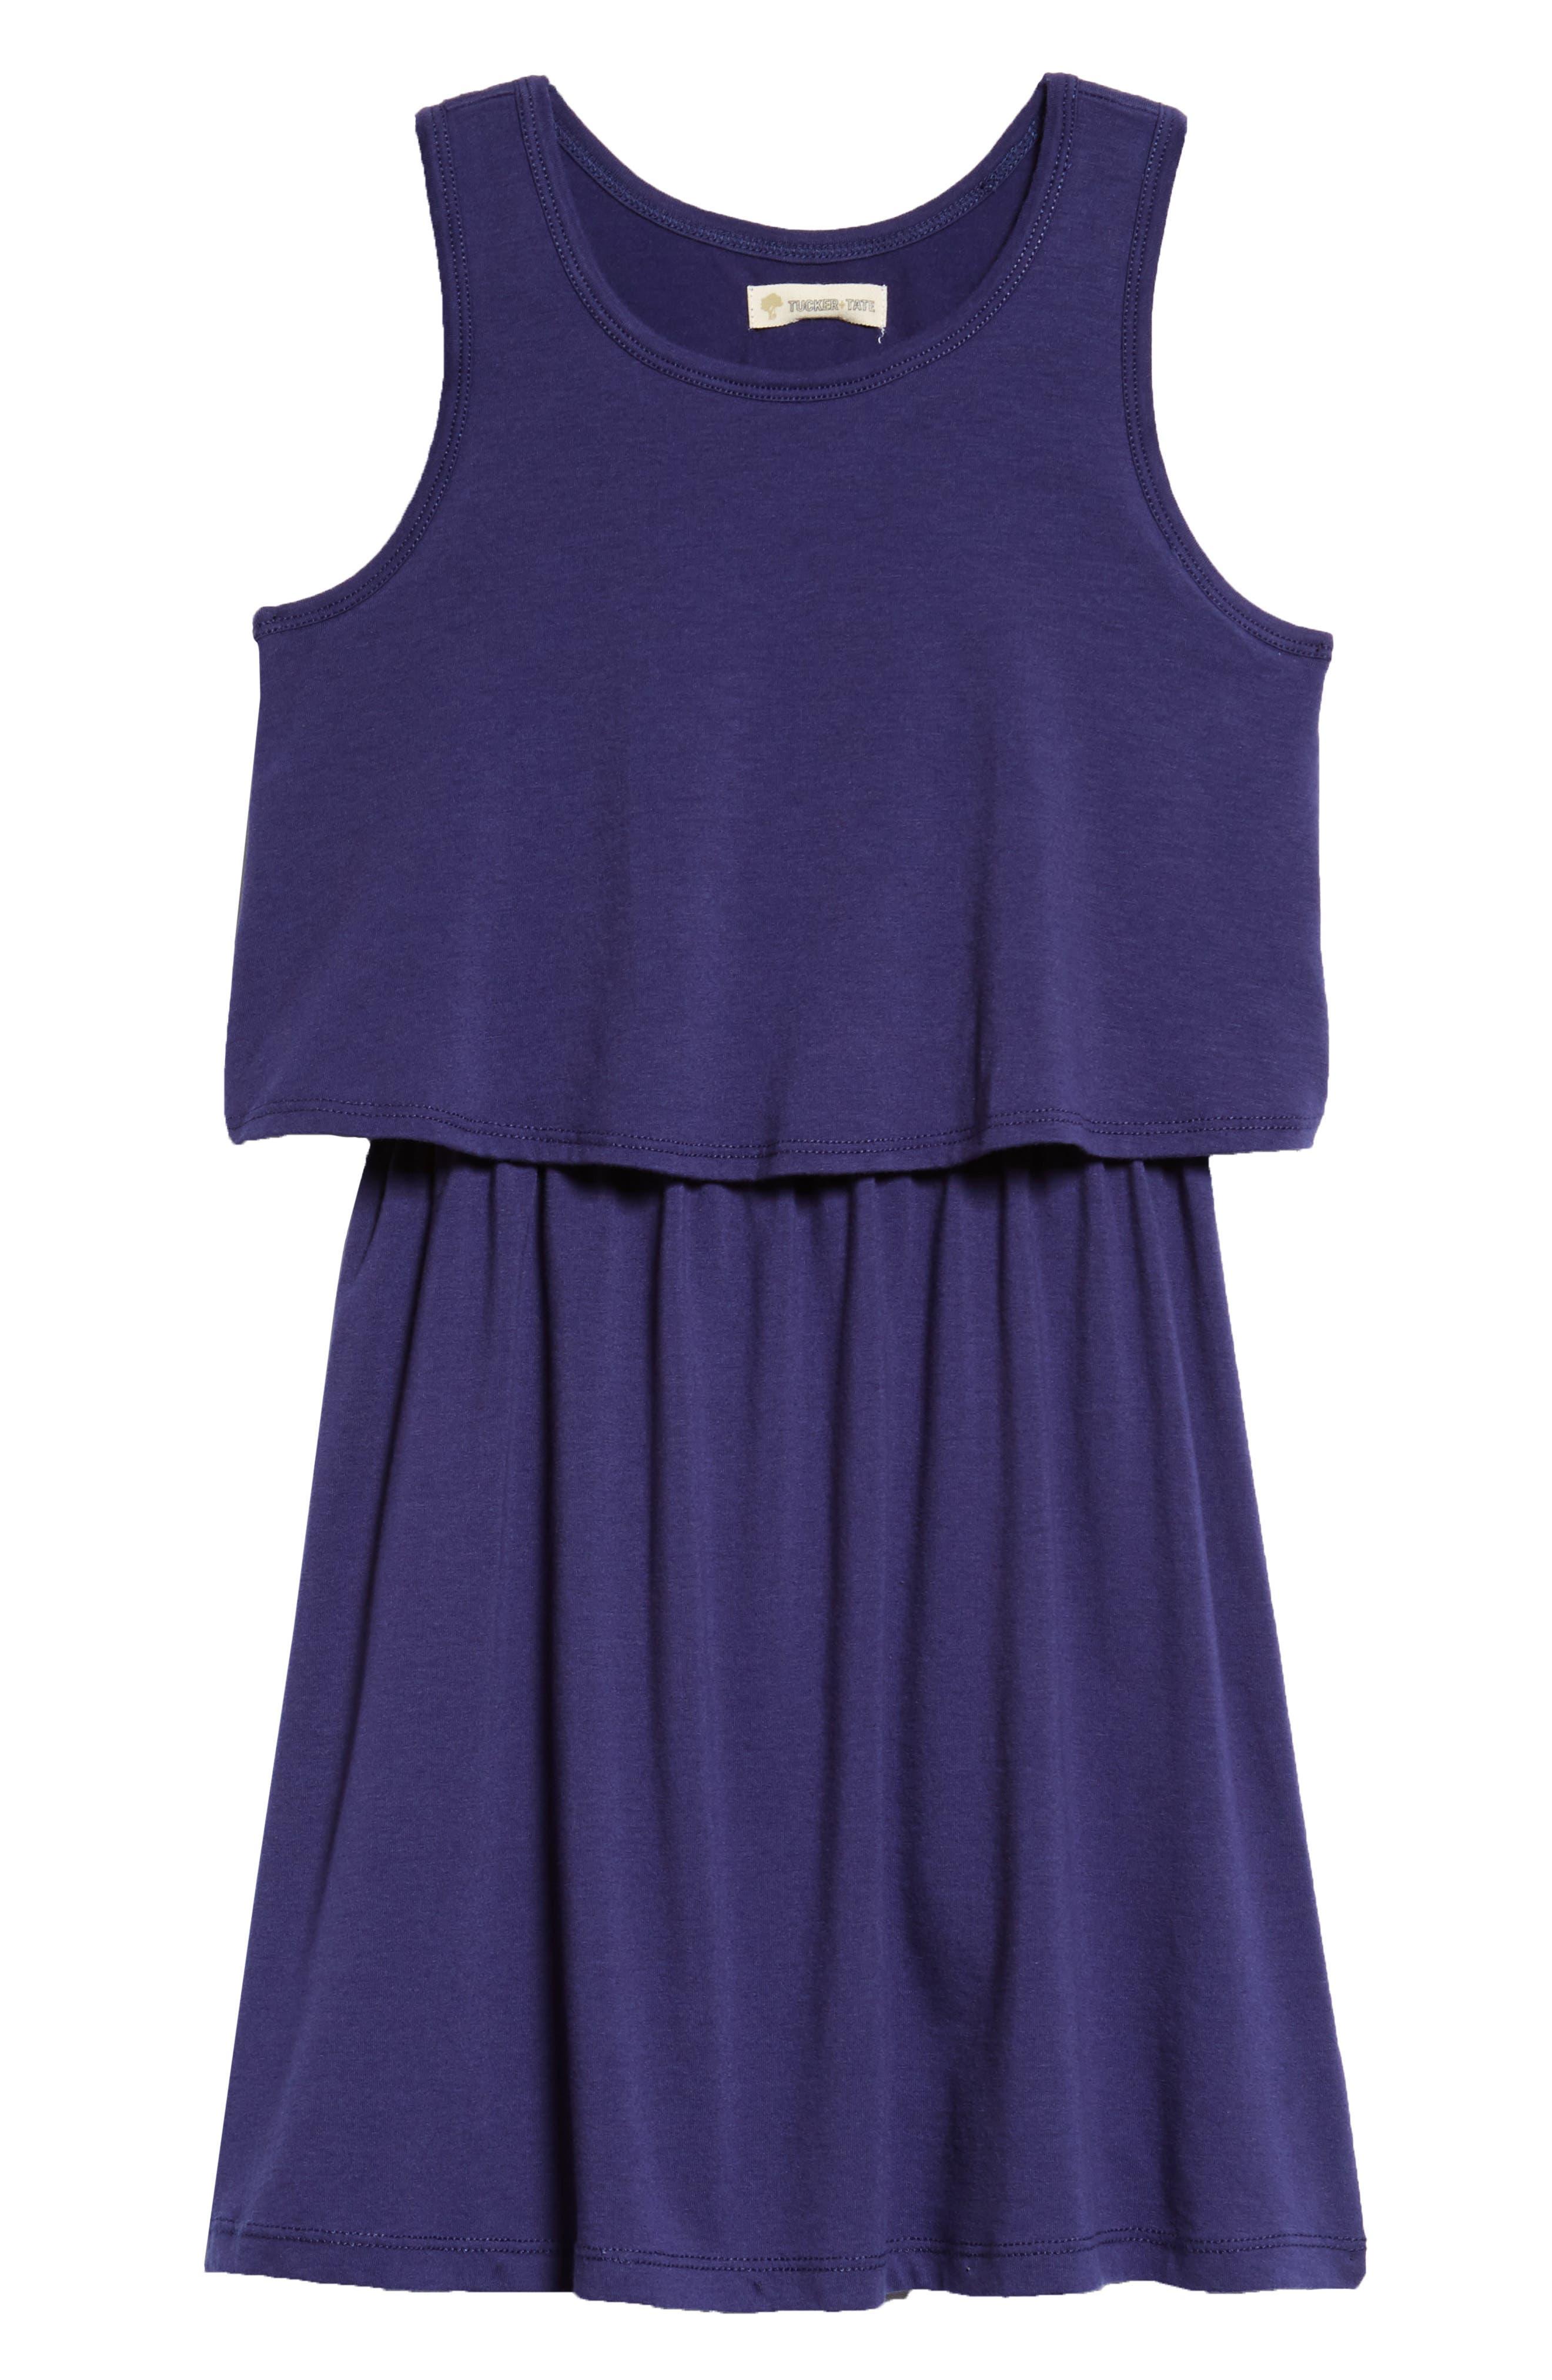 Popover Knit Tank Dress,                             Main thumbnail 1, color,                             Navy Ribbon